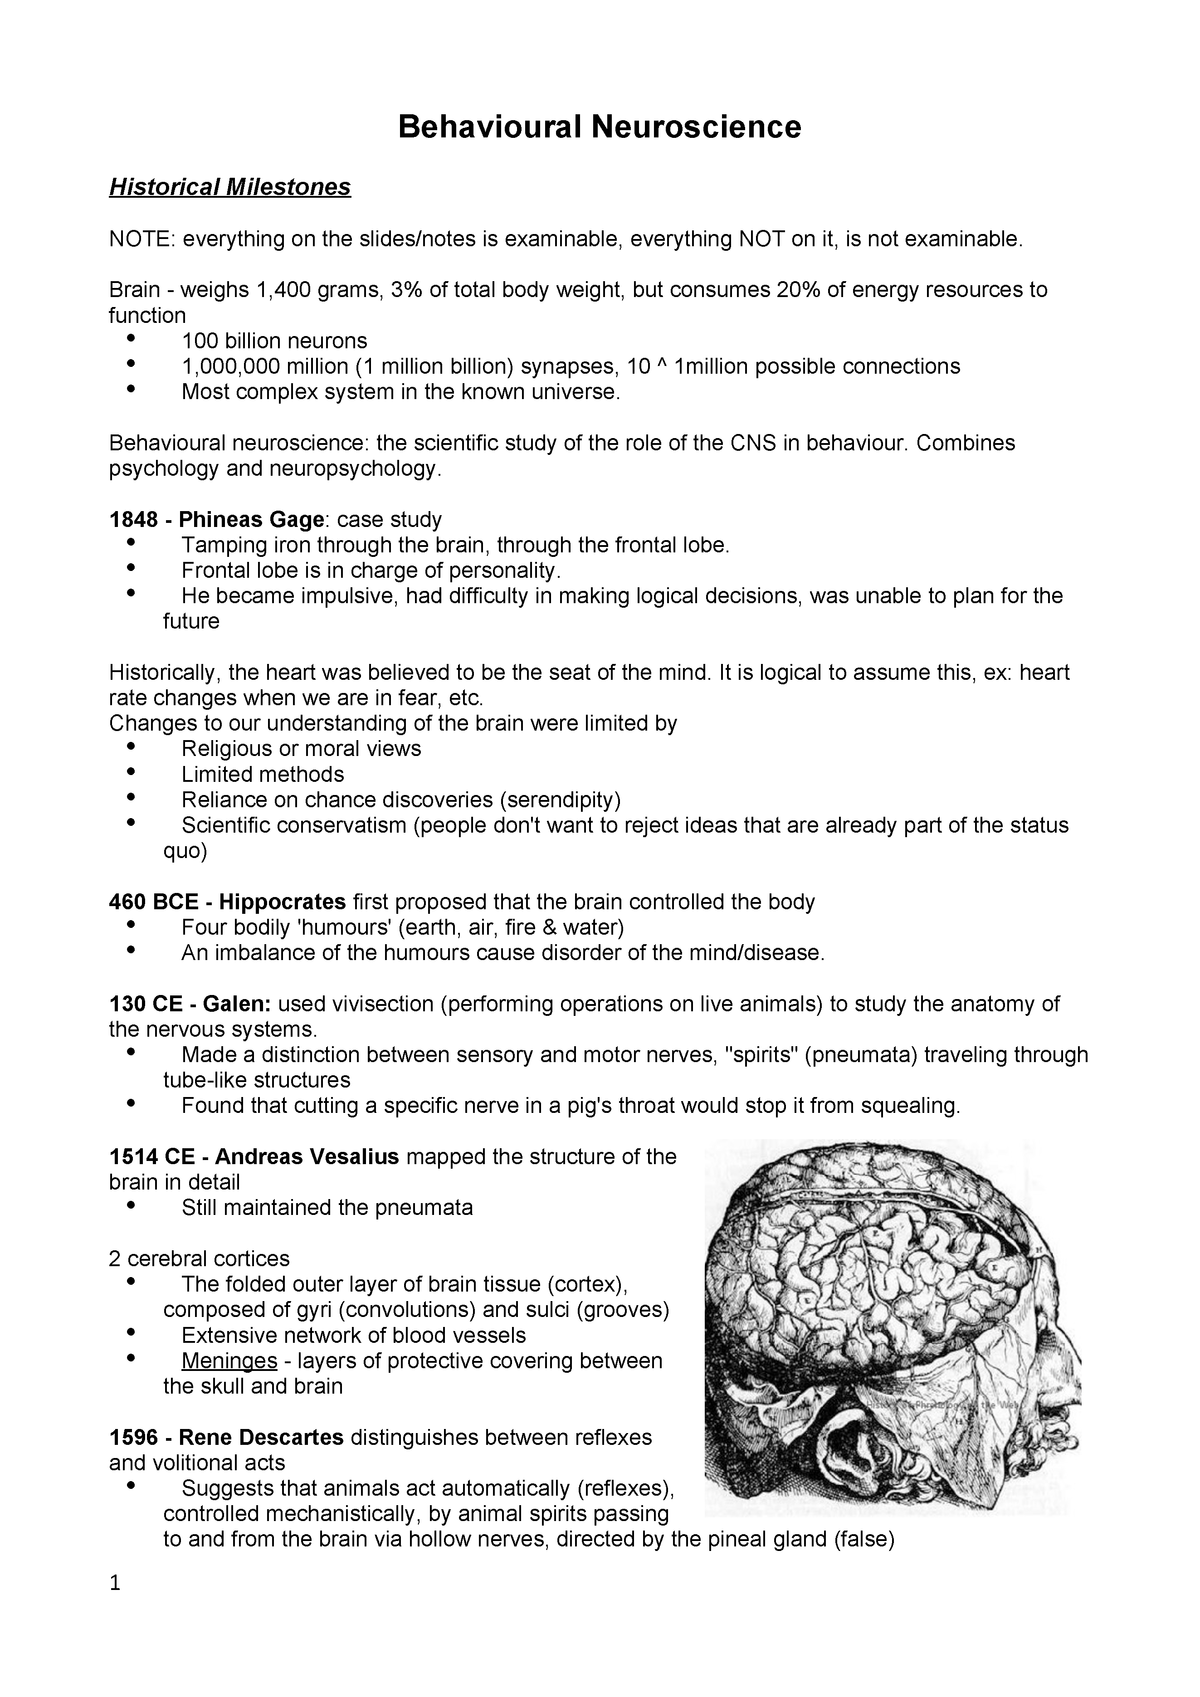 MBB1 Behavioural Neuroscience Notes - PSYC10003: Mind, Brain